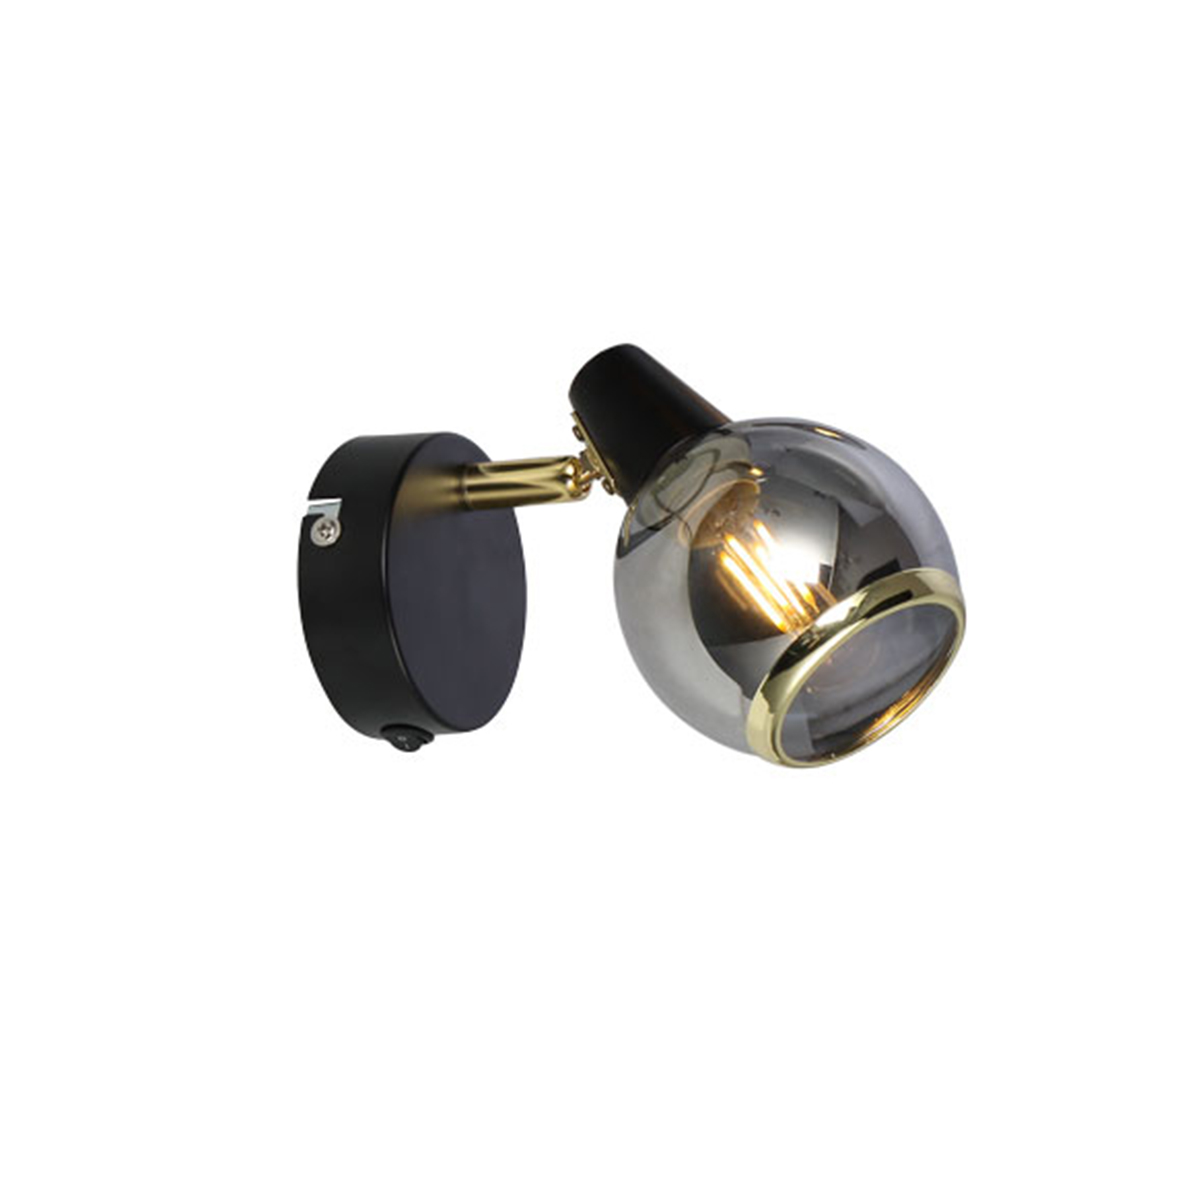 Spot lampa Iskra/1 6602046